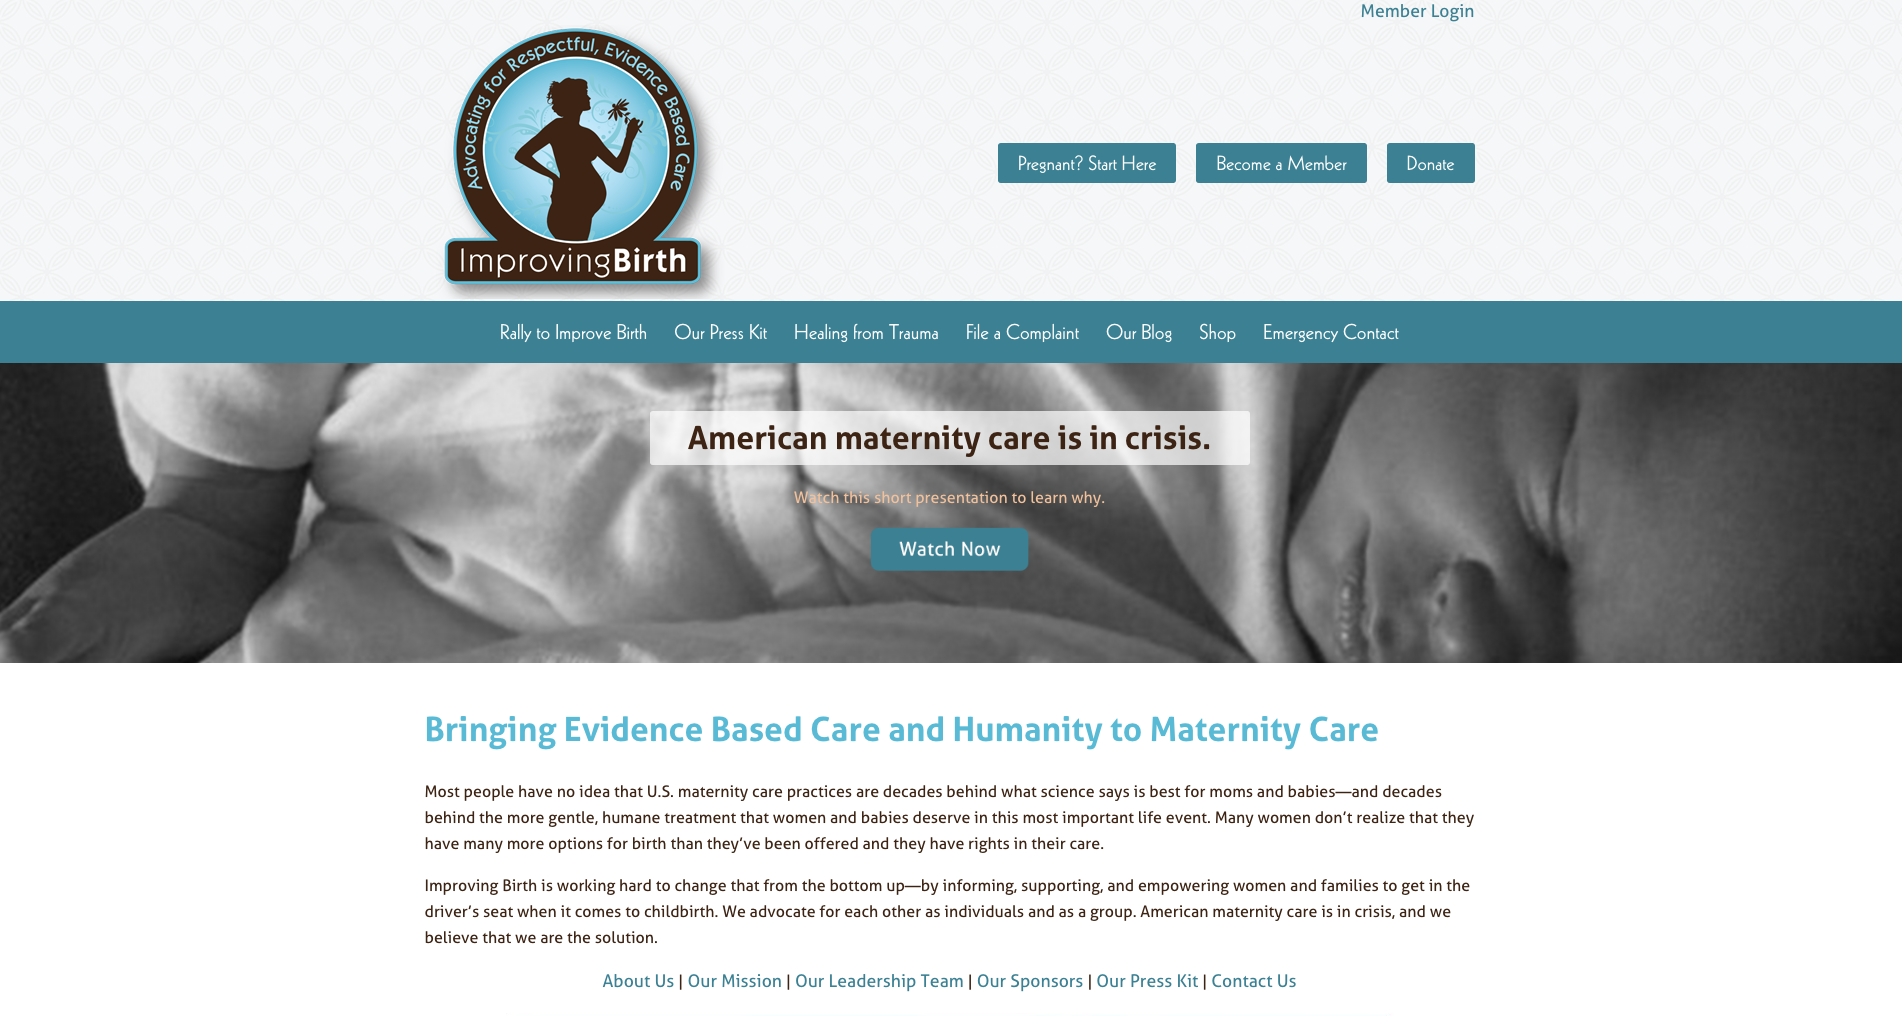 ImprovingBirth website, designed by Hoppel Design